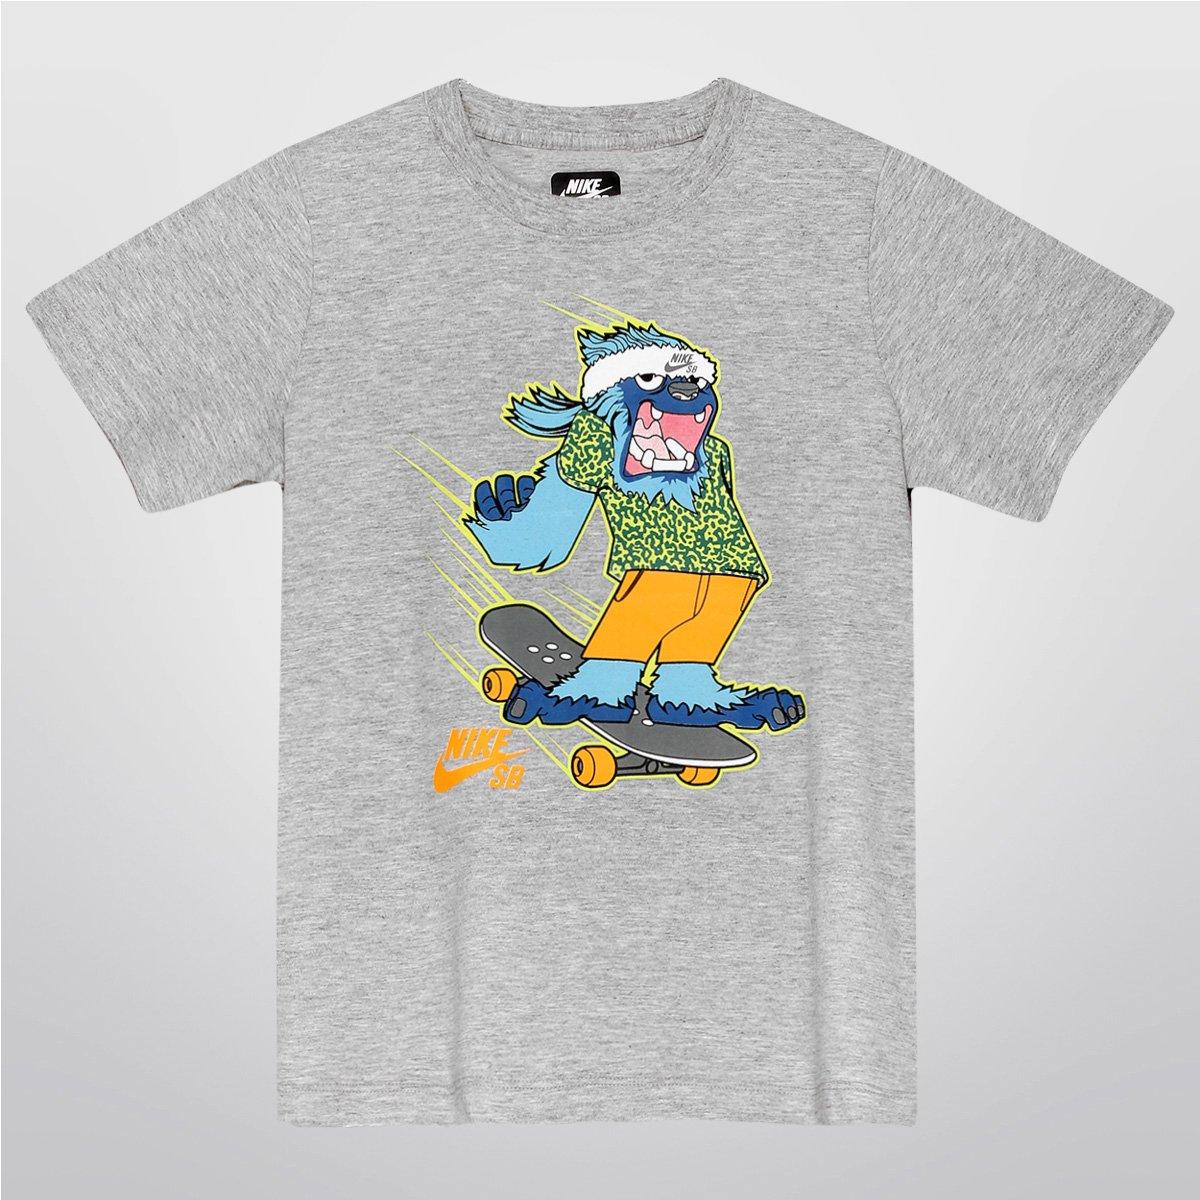 65fdb9491317b Camiseta Nike SB Yeti Infantil - Compre Agora